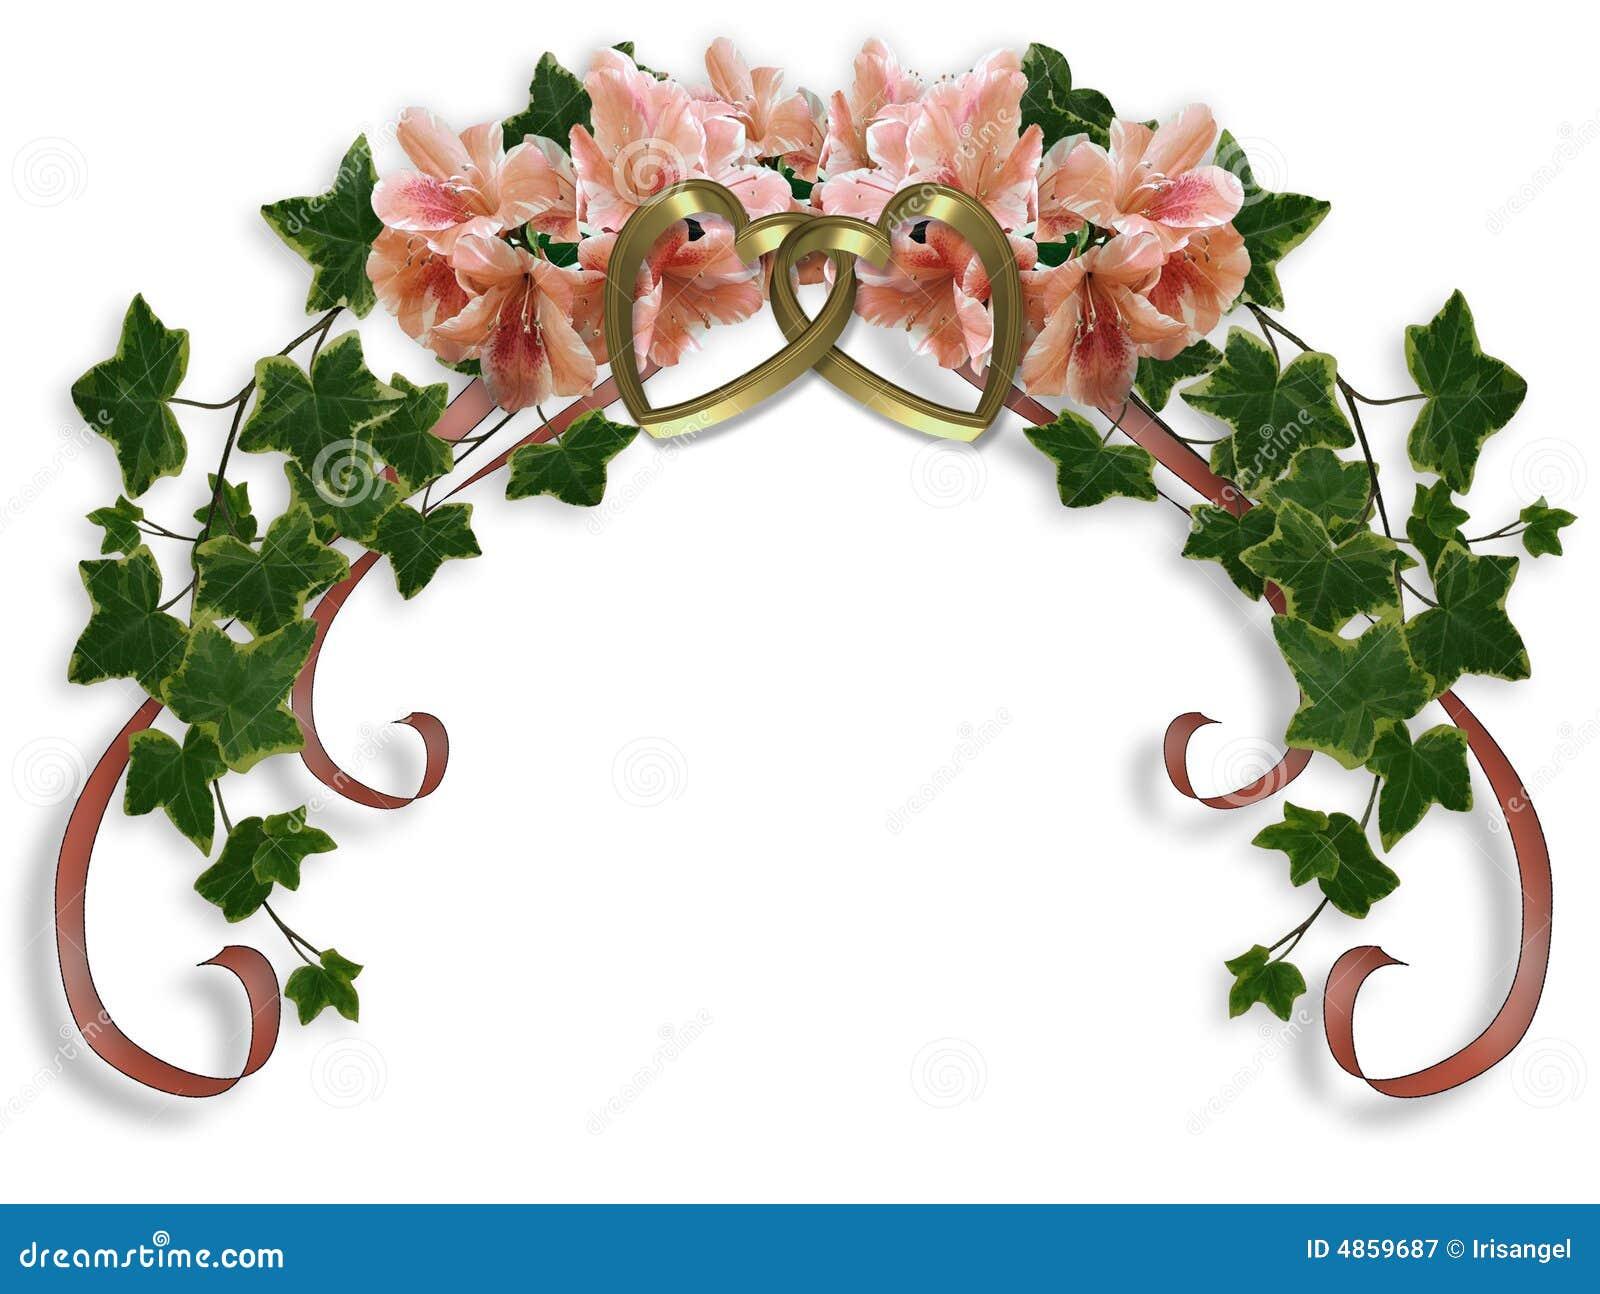 Ivy And Azaleas Floral Wedding Design Royalty Free Stock